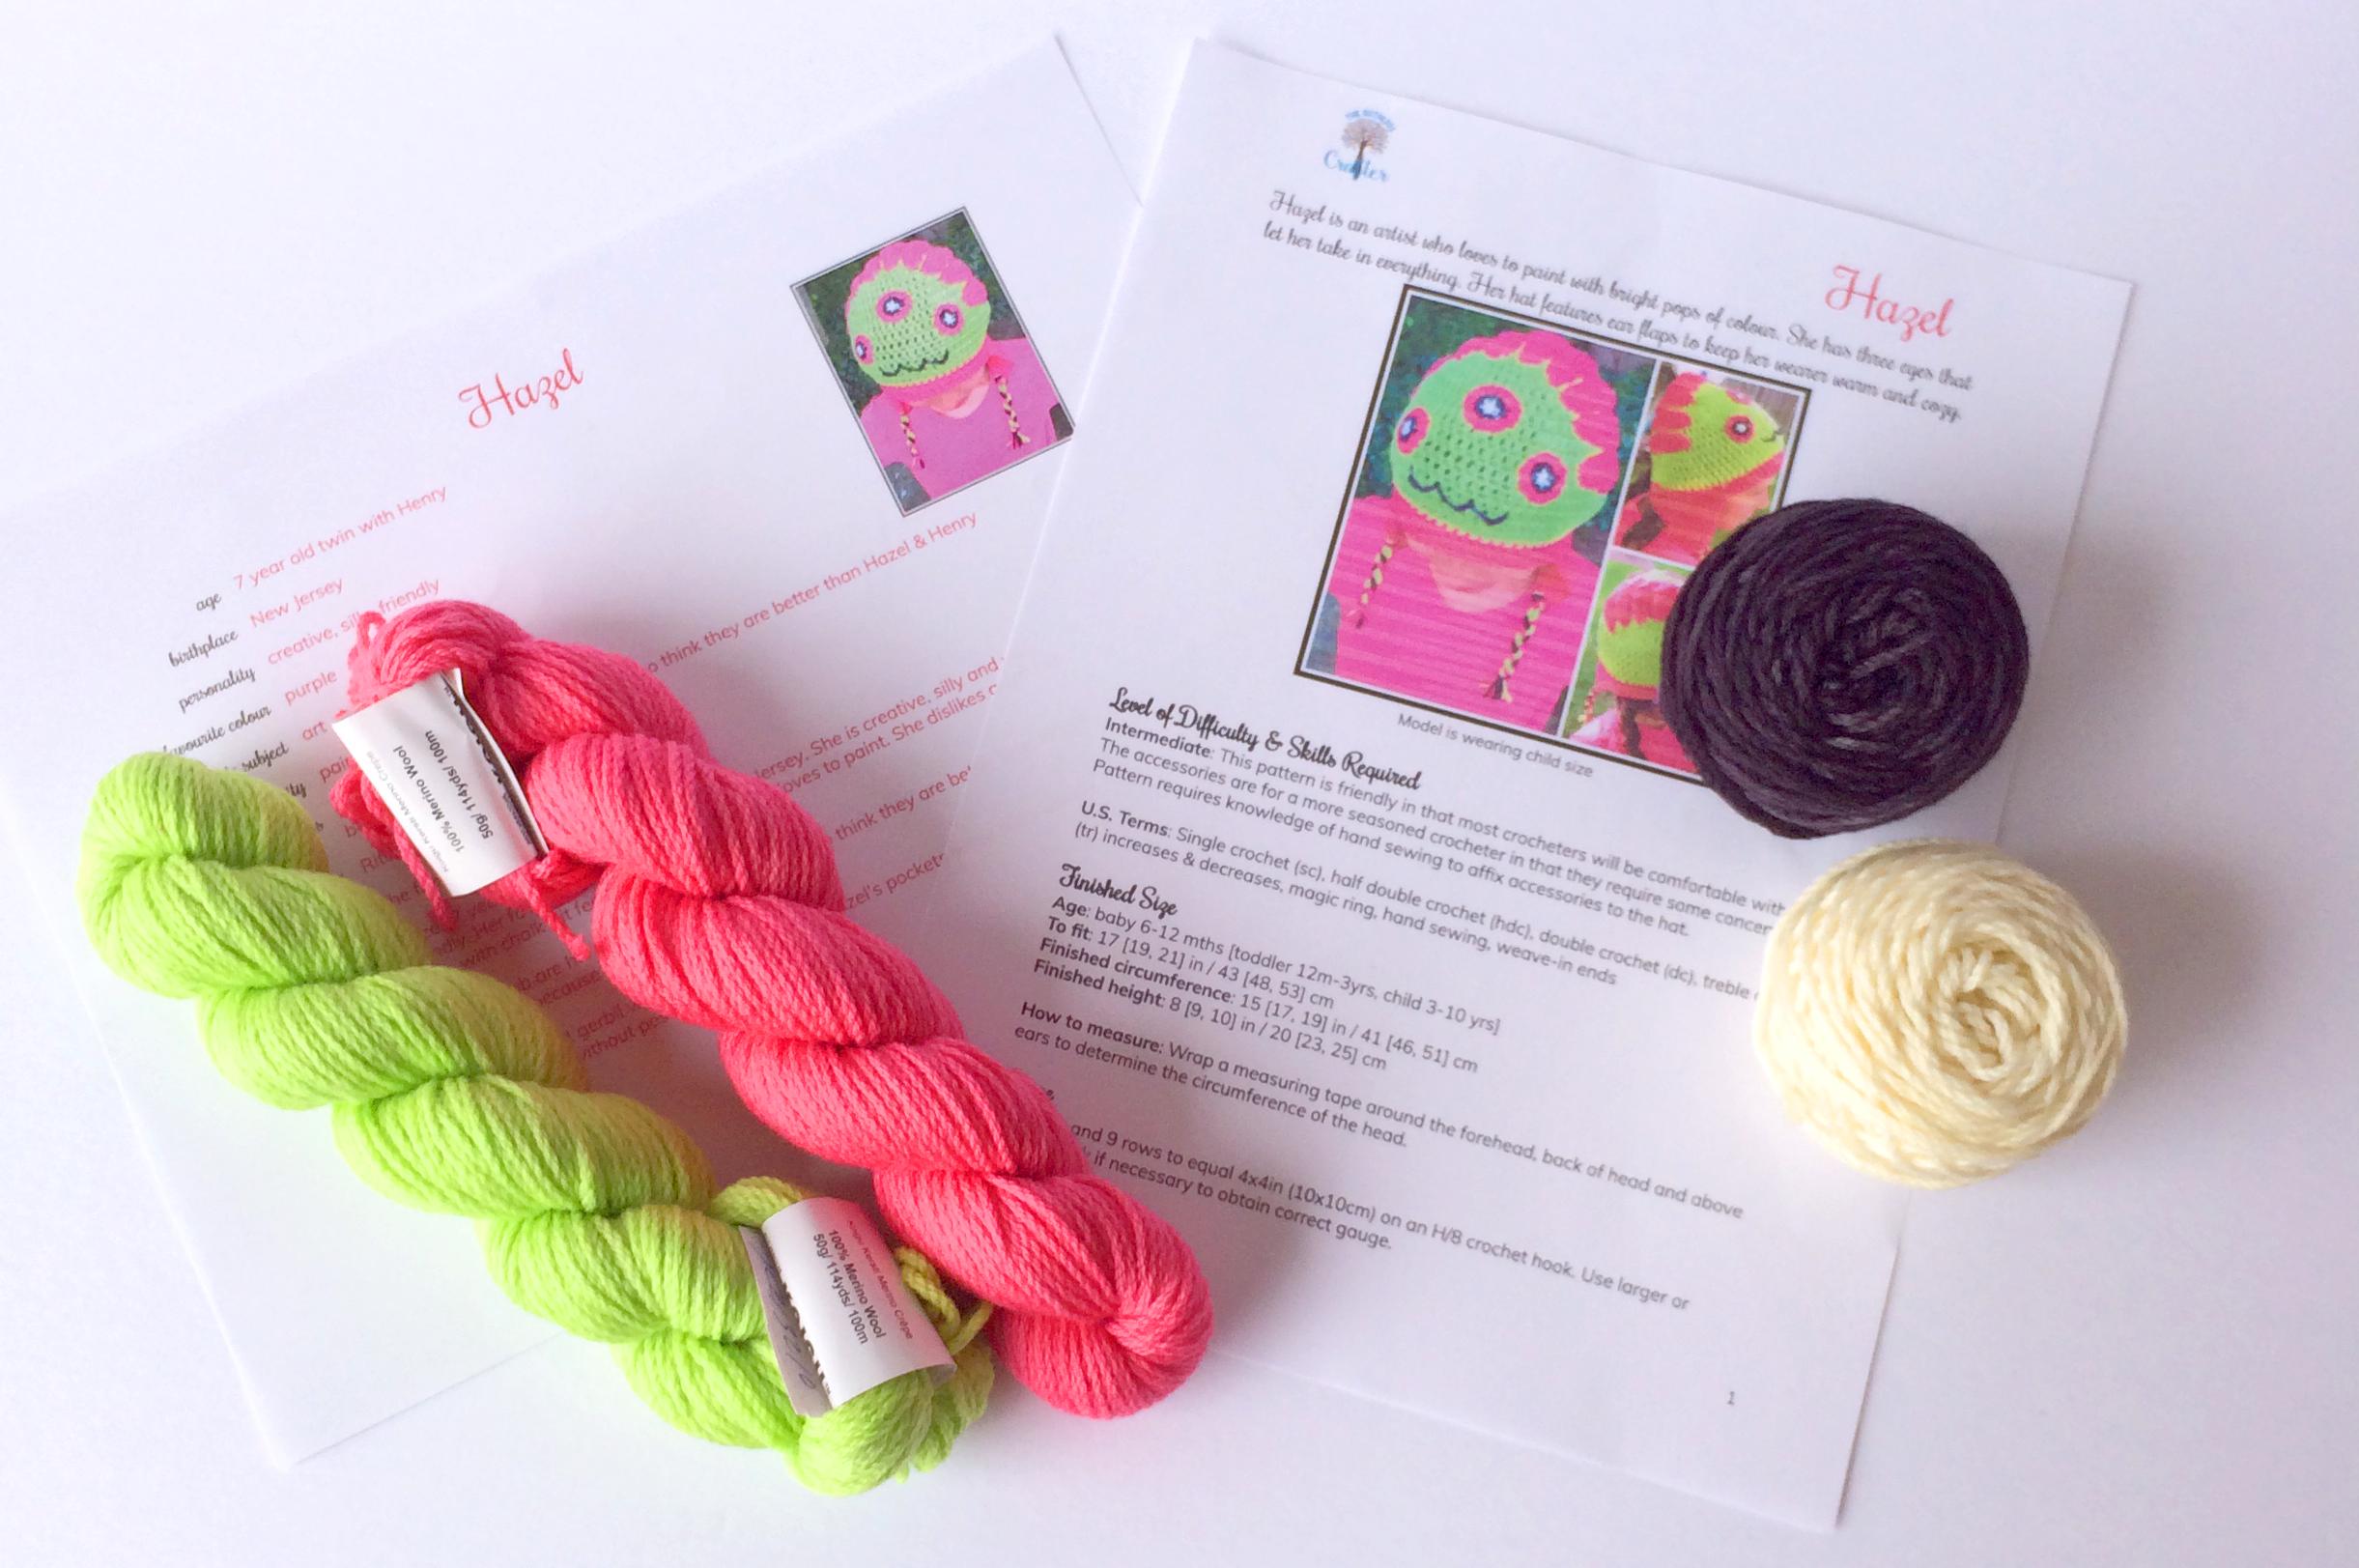 Crochet diy kit hazel infant toddler or child size crochet diy kit hazel infant toddler or child size ccuart Choice Image